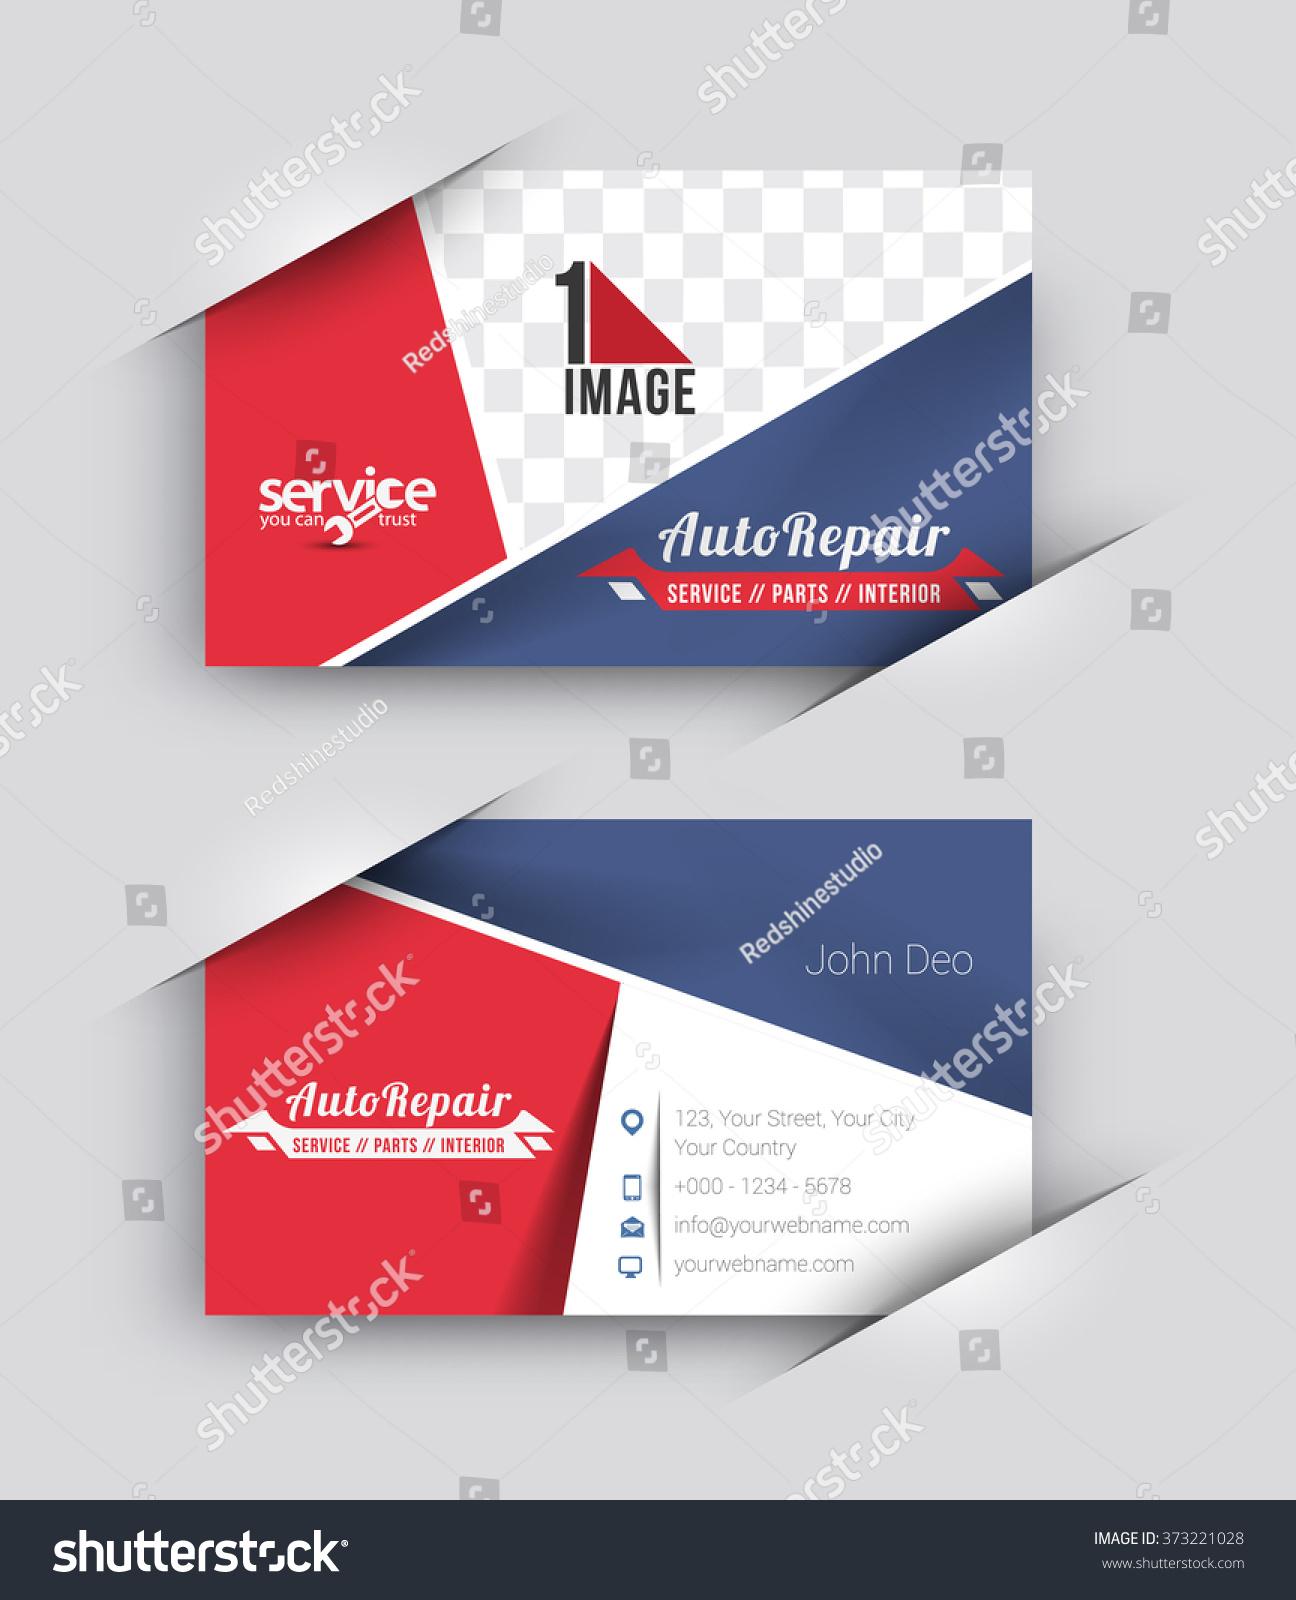 Automobile Center Business Card Mock Design Stock Vector 373221028 ...